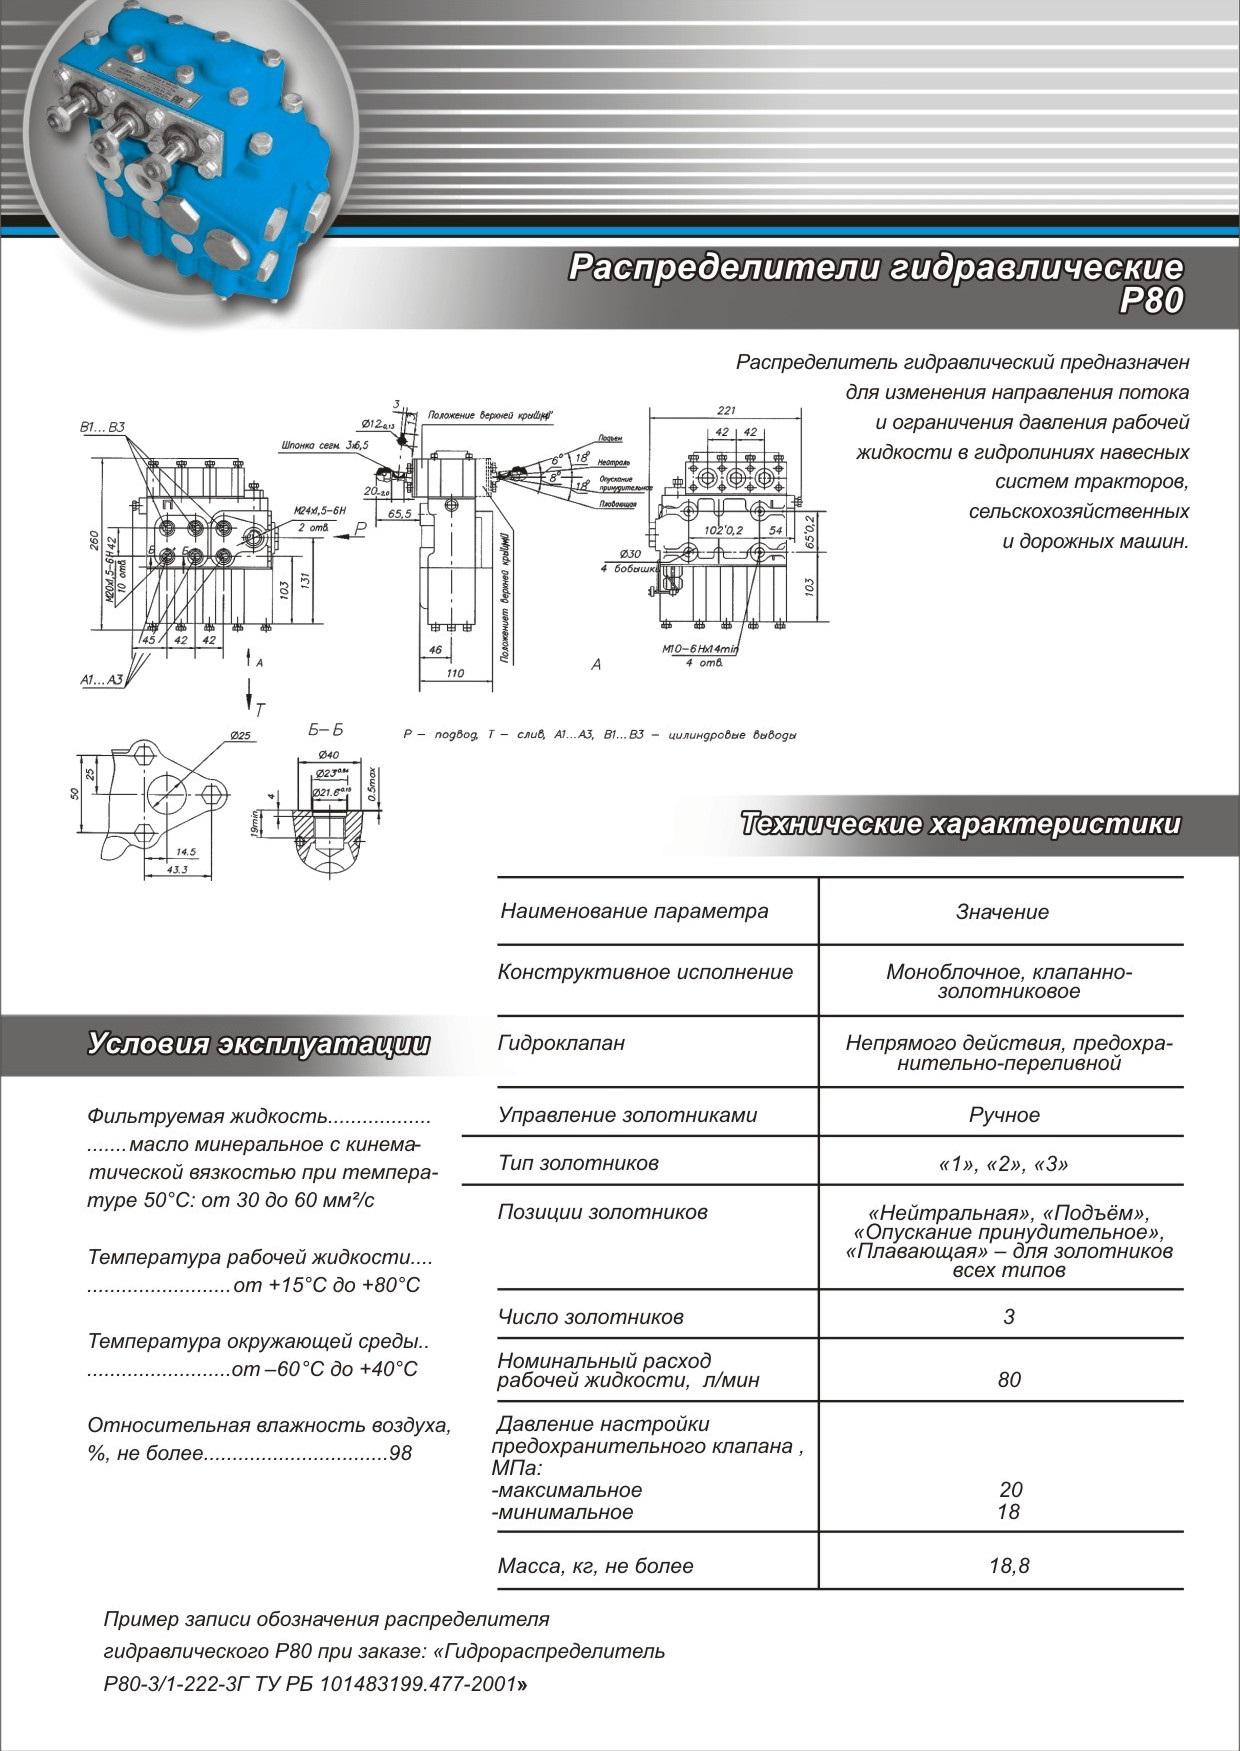 Raspredeliteli-gidravlicheskie-R80